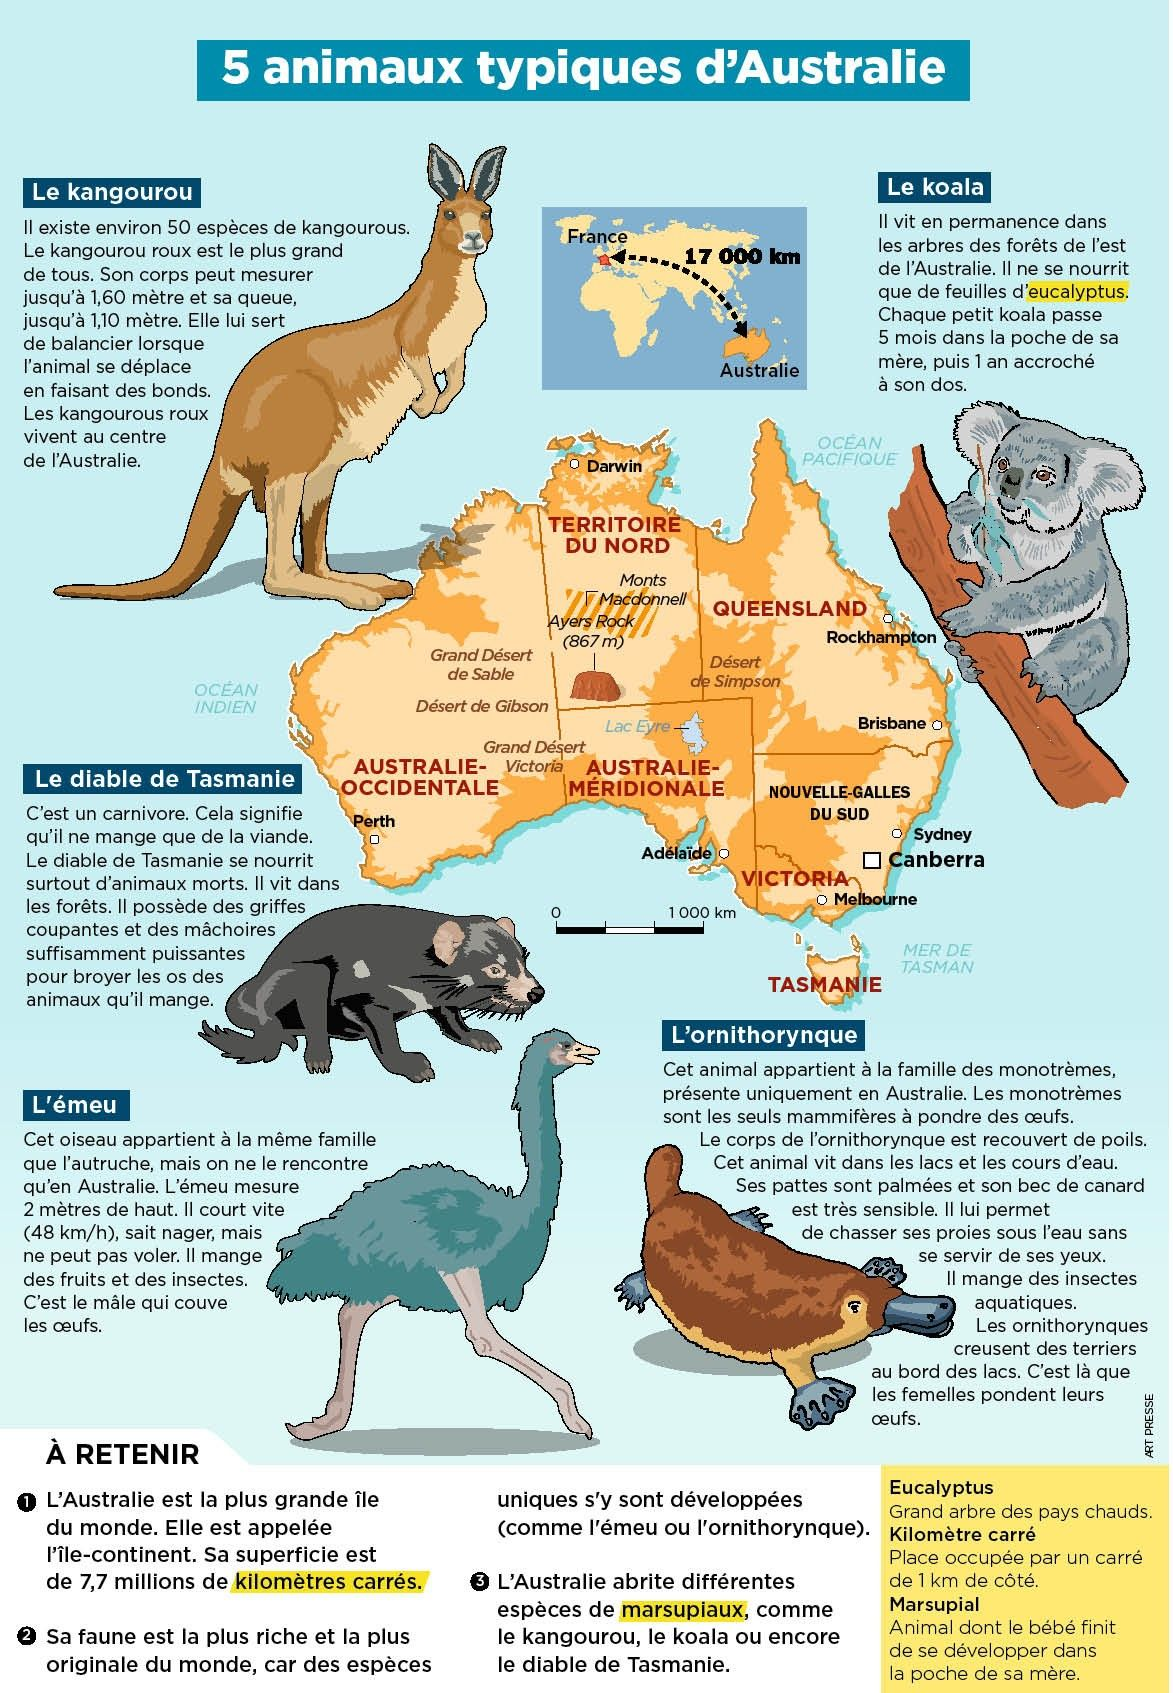 Epingle Par Kongpol Chamnan Sur Montessori Nom Des Animaux Vie Animale Zoologie